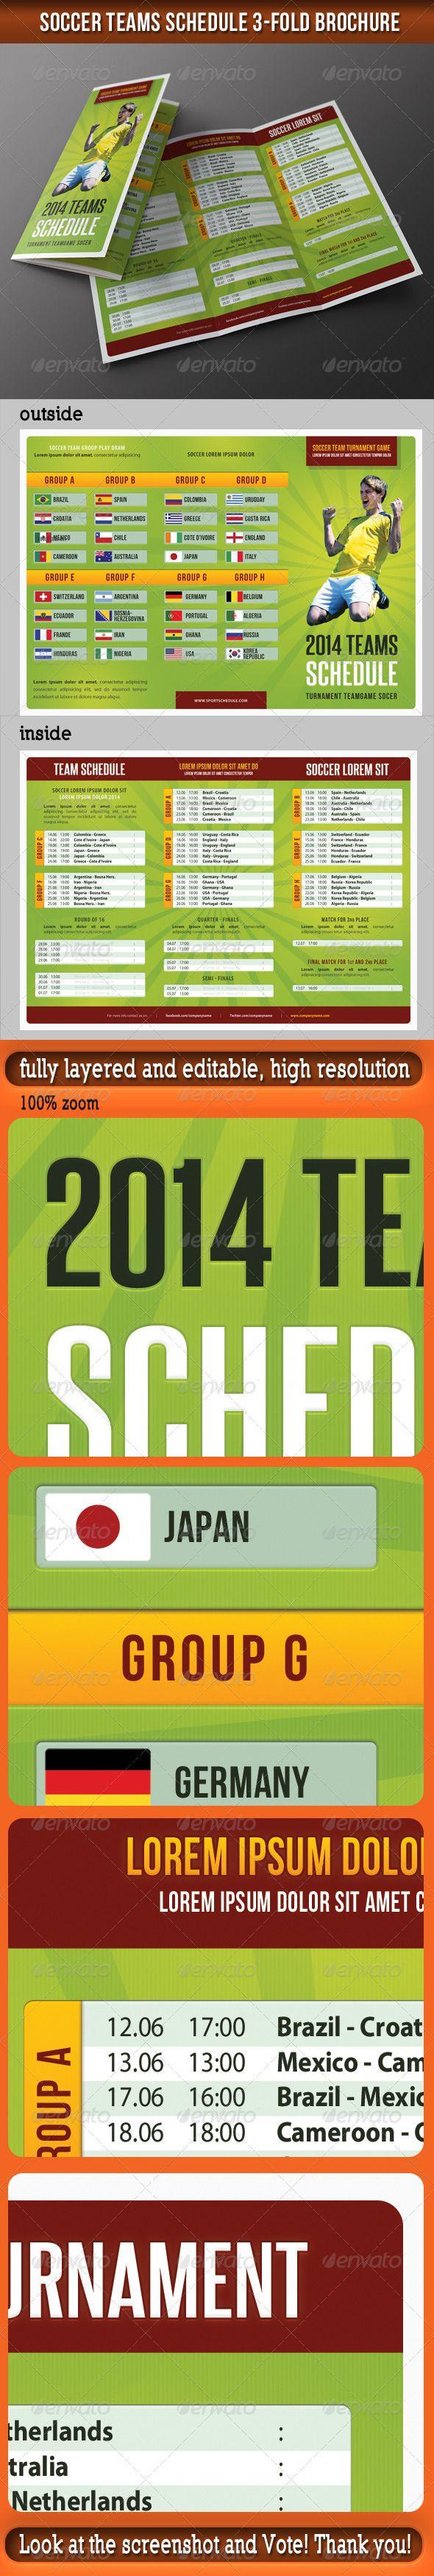 Soccer Match Schedule 2014 3-Fold Brochure - Informational Brochures